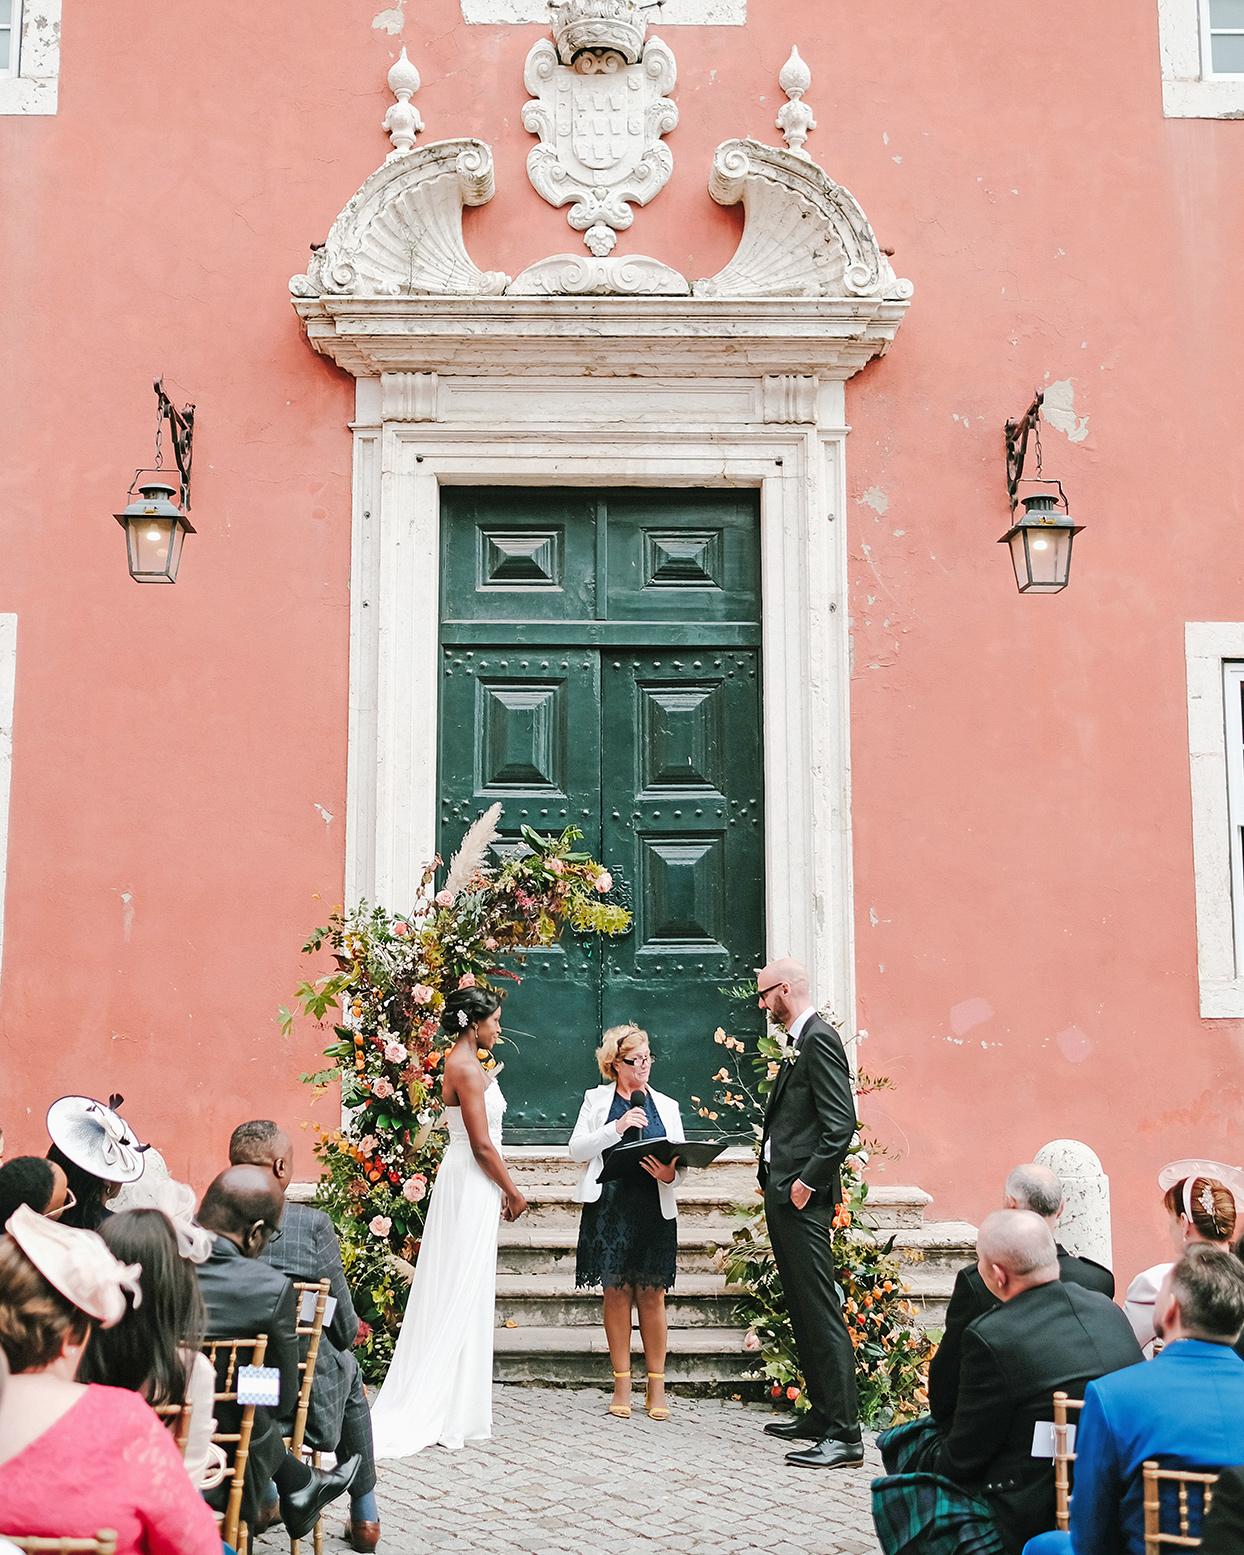 emily scott wedding ceremony officiant reading